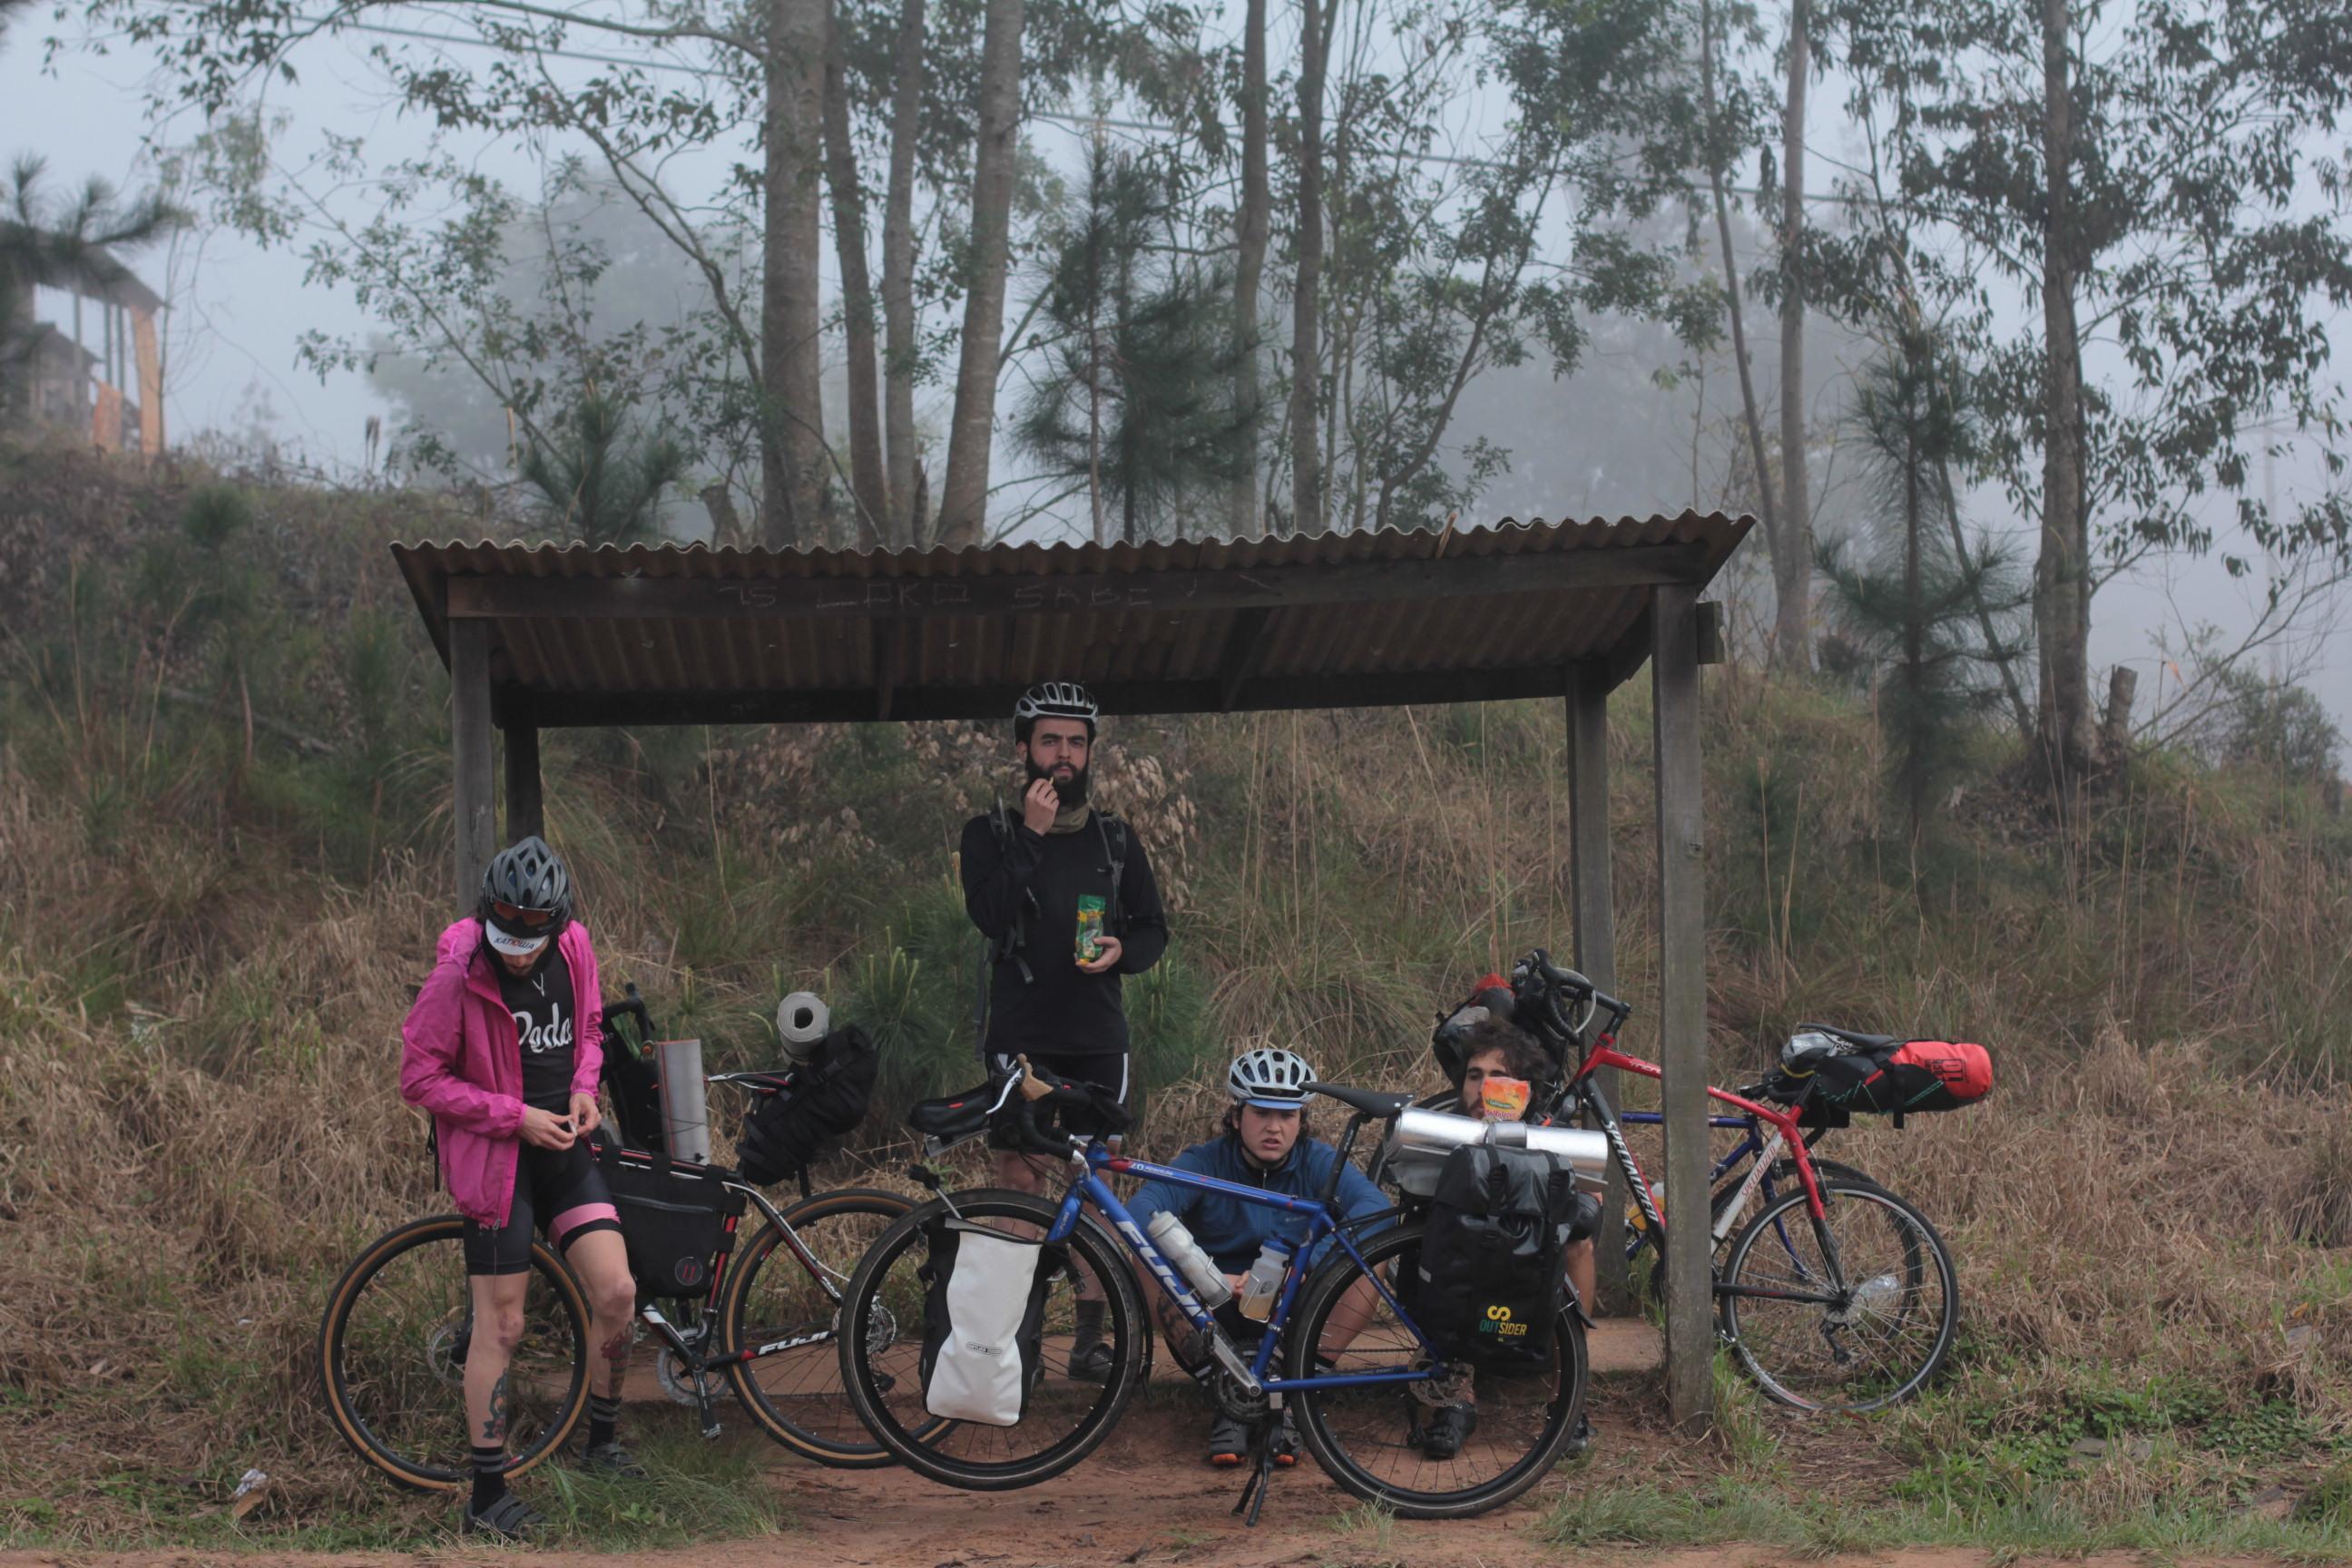 02-expresso-patagonia-porto-alegre-sao-gabriel-bike-packing